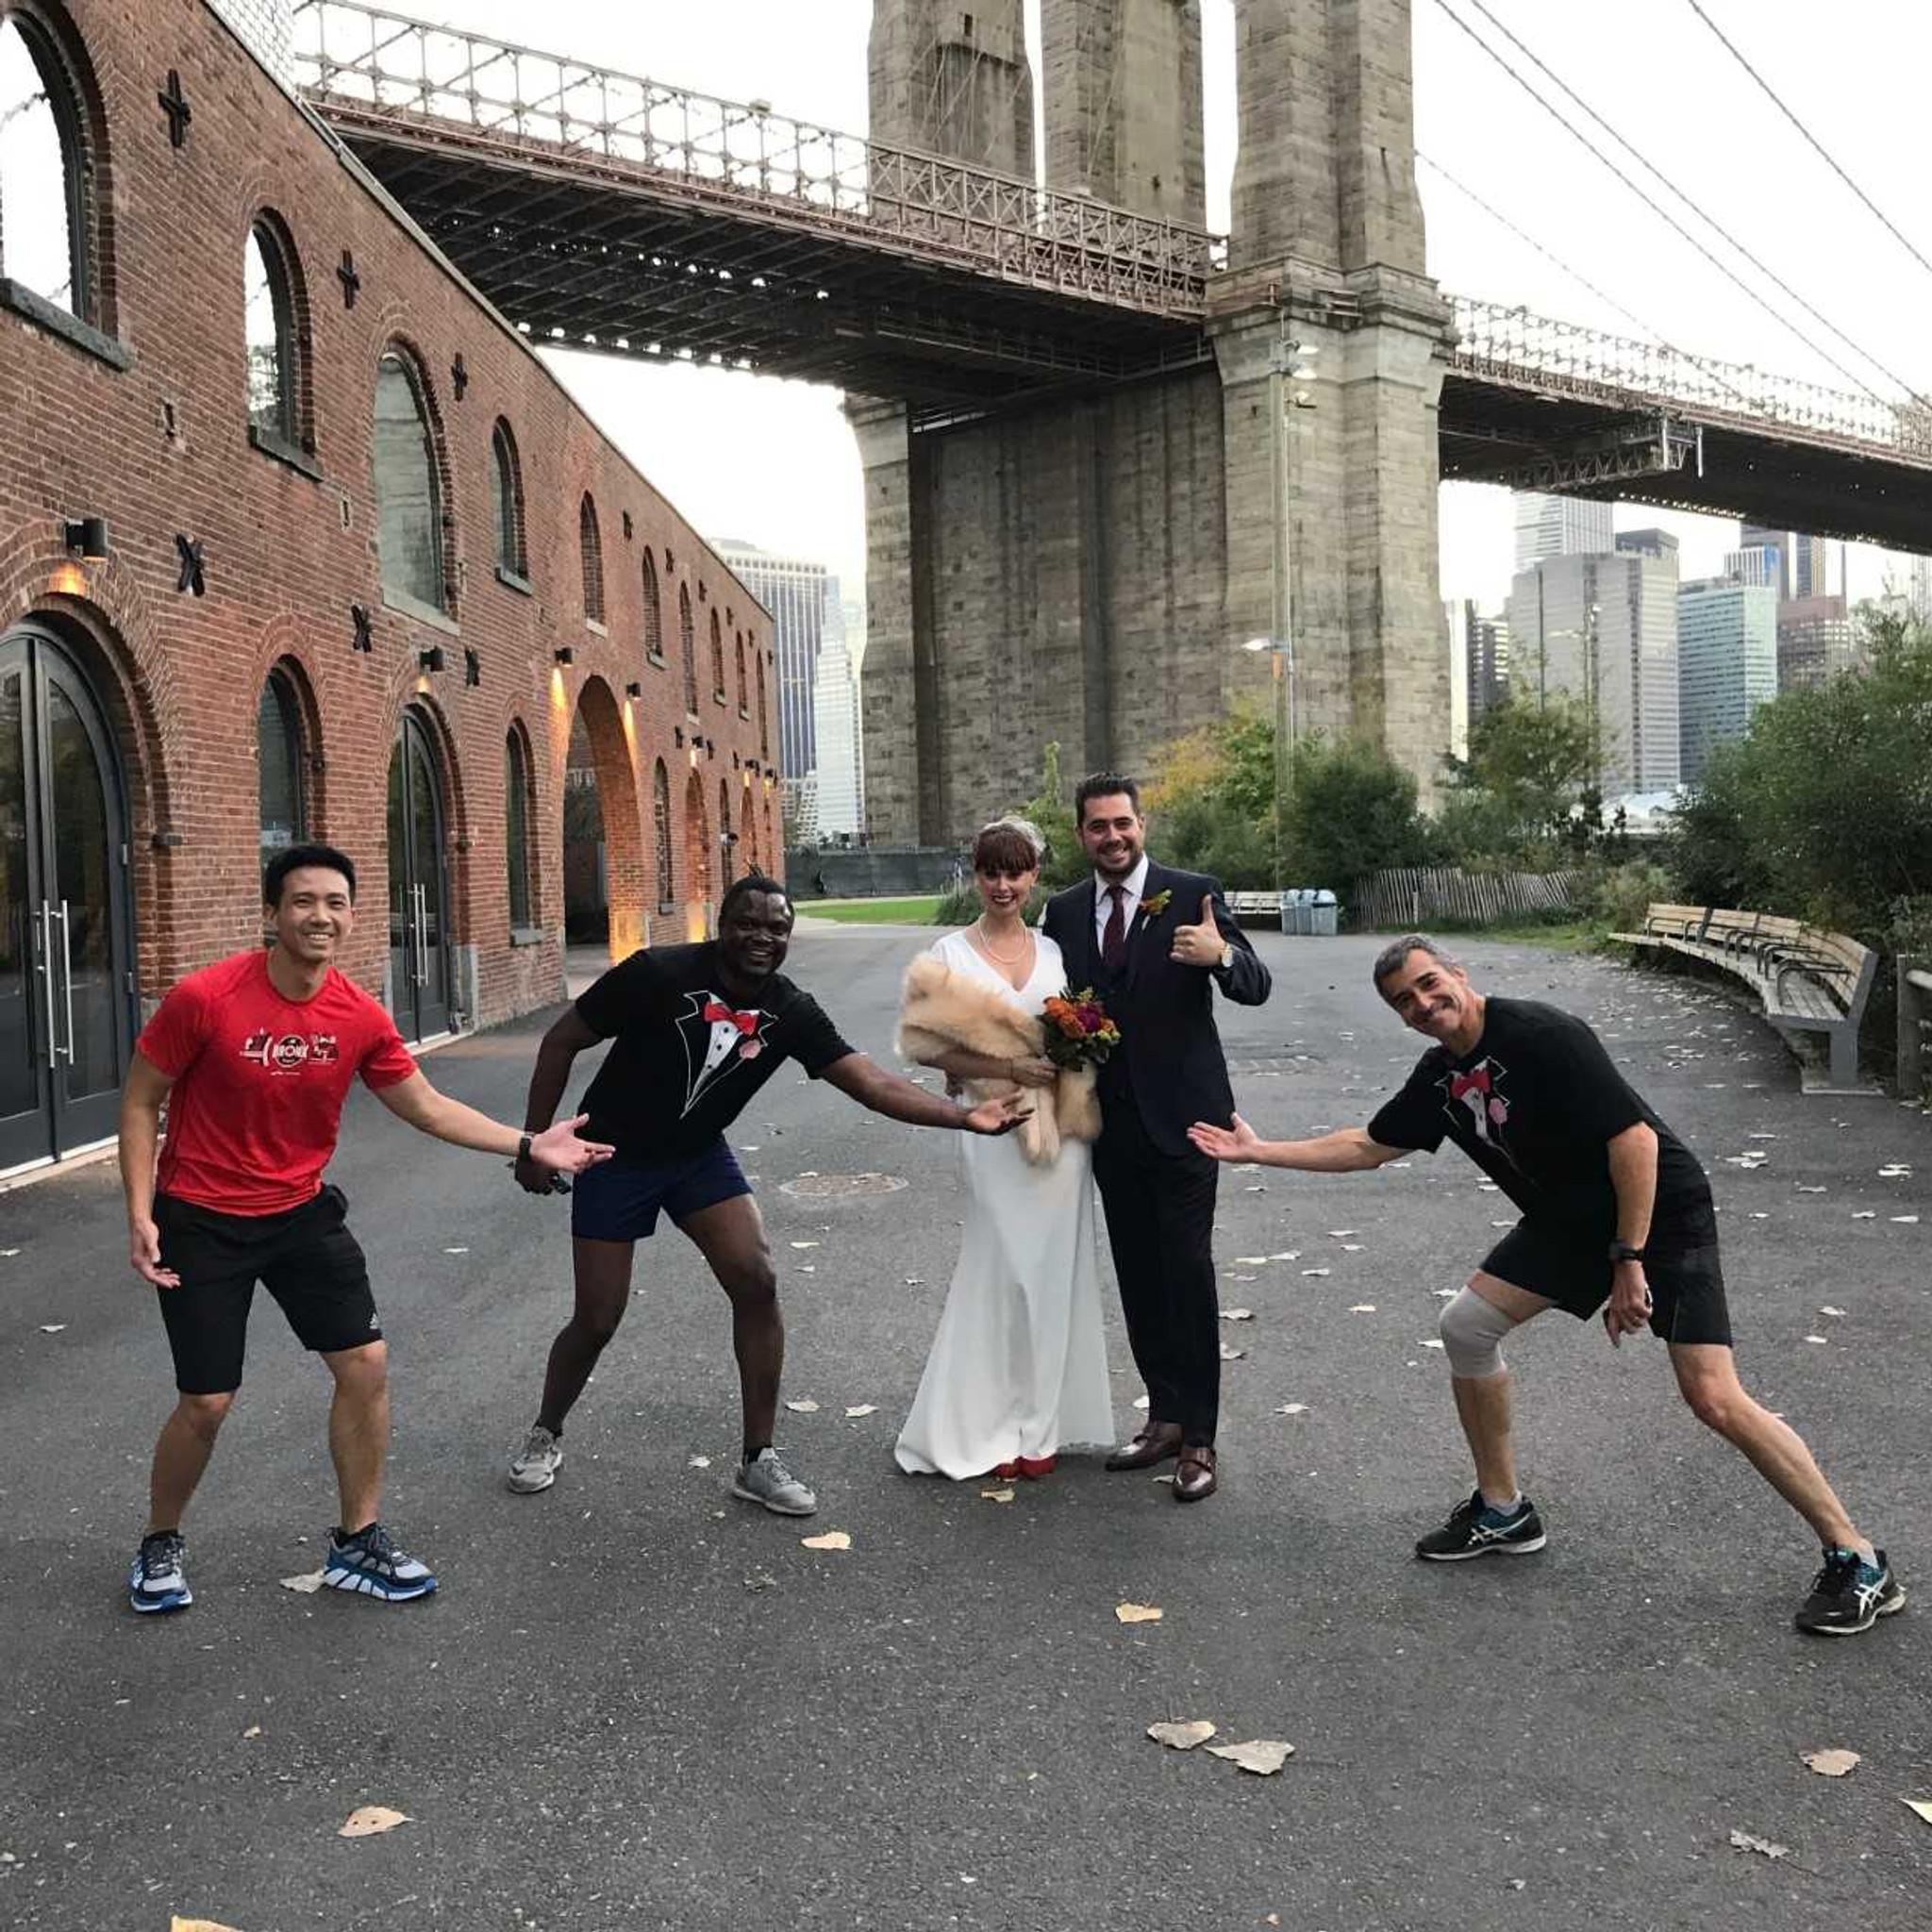 Brooklyn Bridge Photobombers